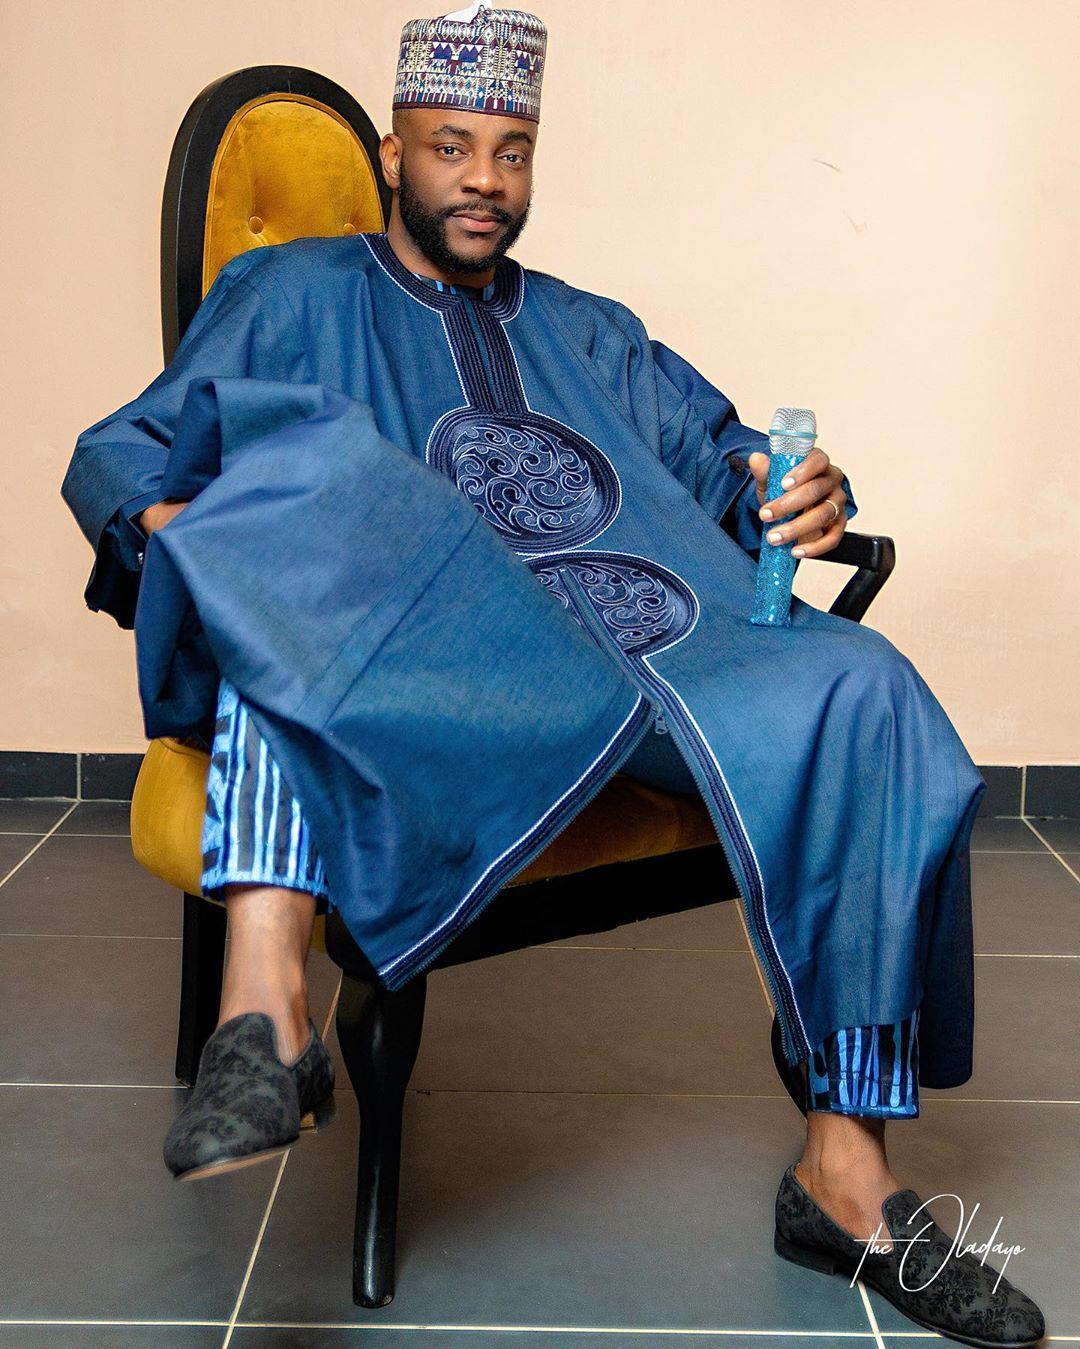 #BBNaija Host Ebuka Obi-Uchendu looked African & Cool at Last Night's Live Eviction Show